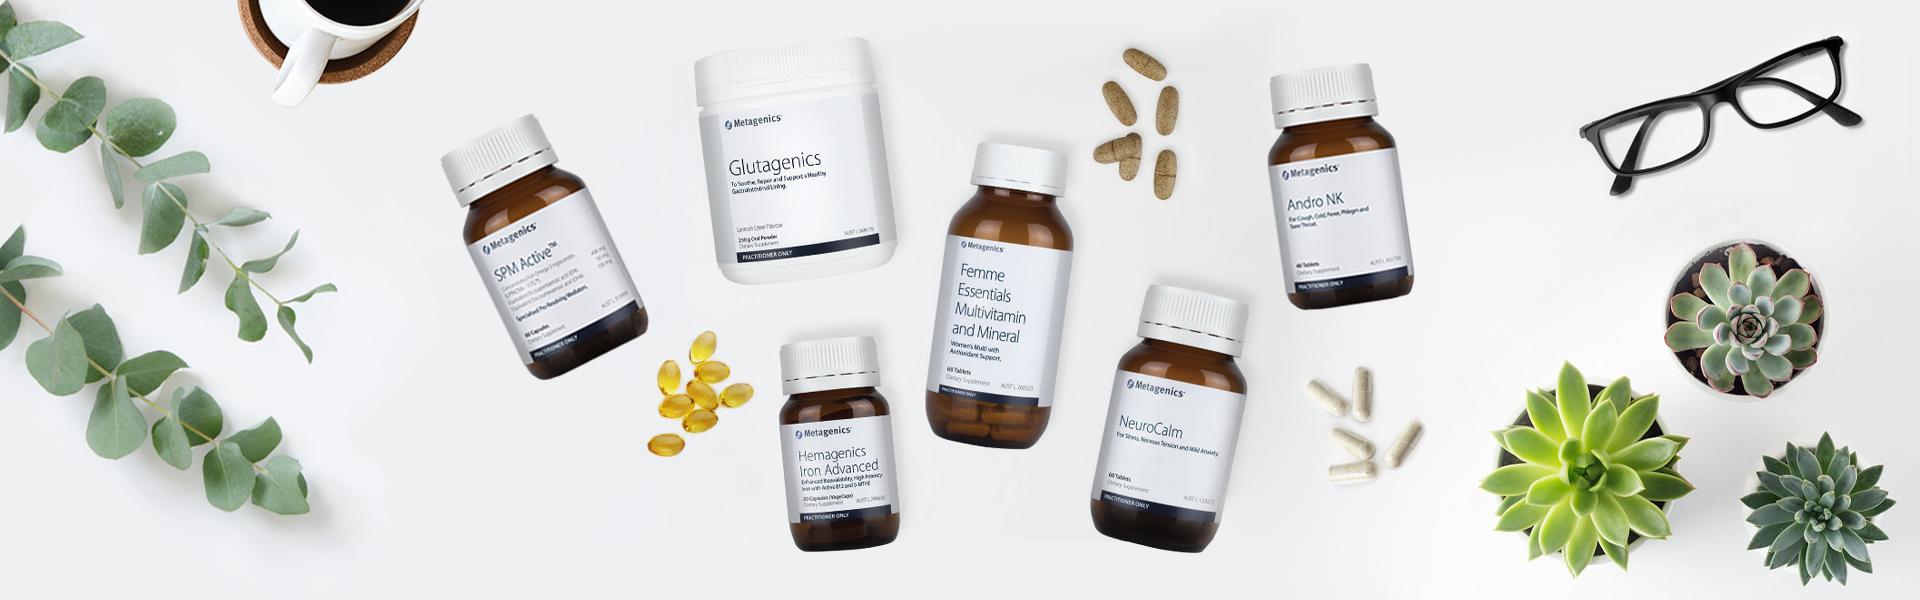 Metagenics Natural Medicines